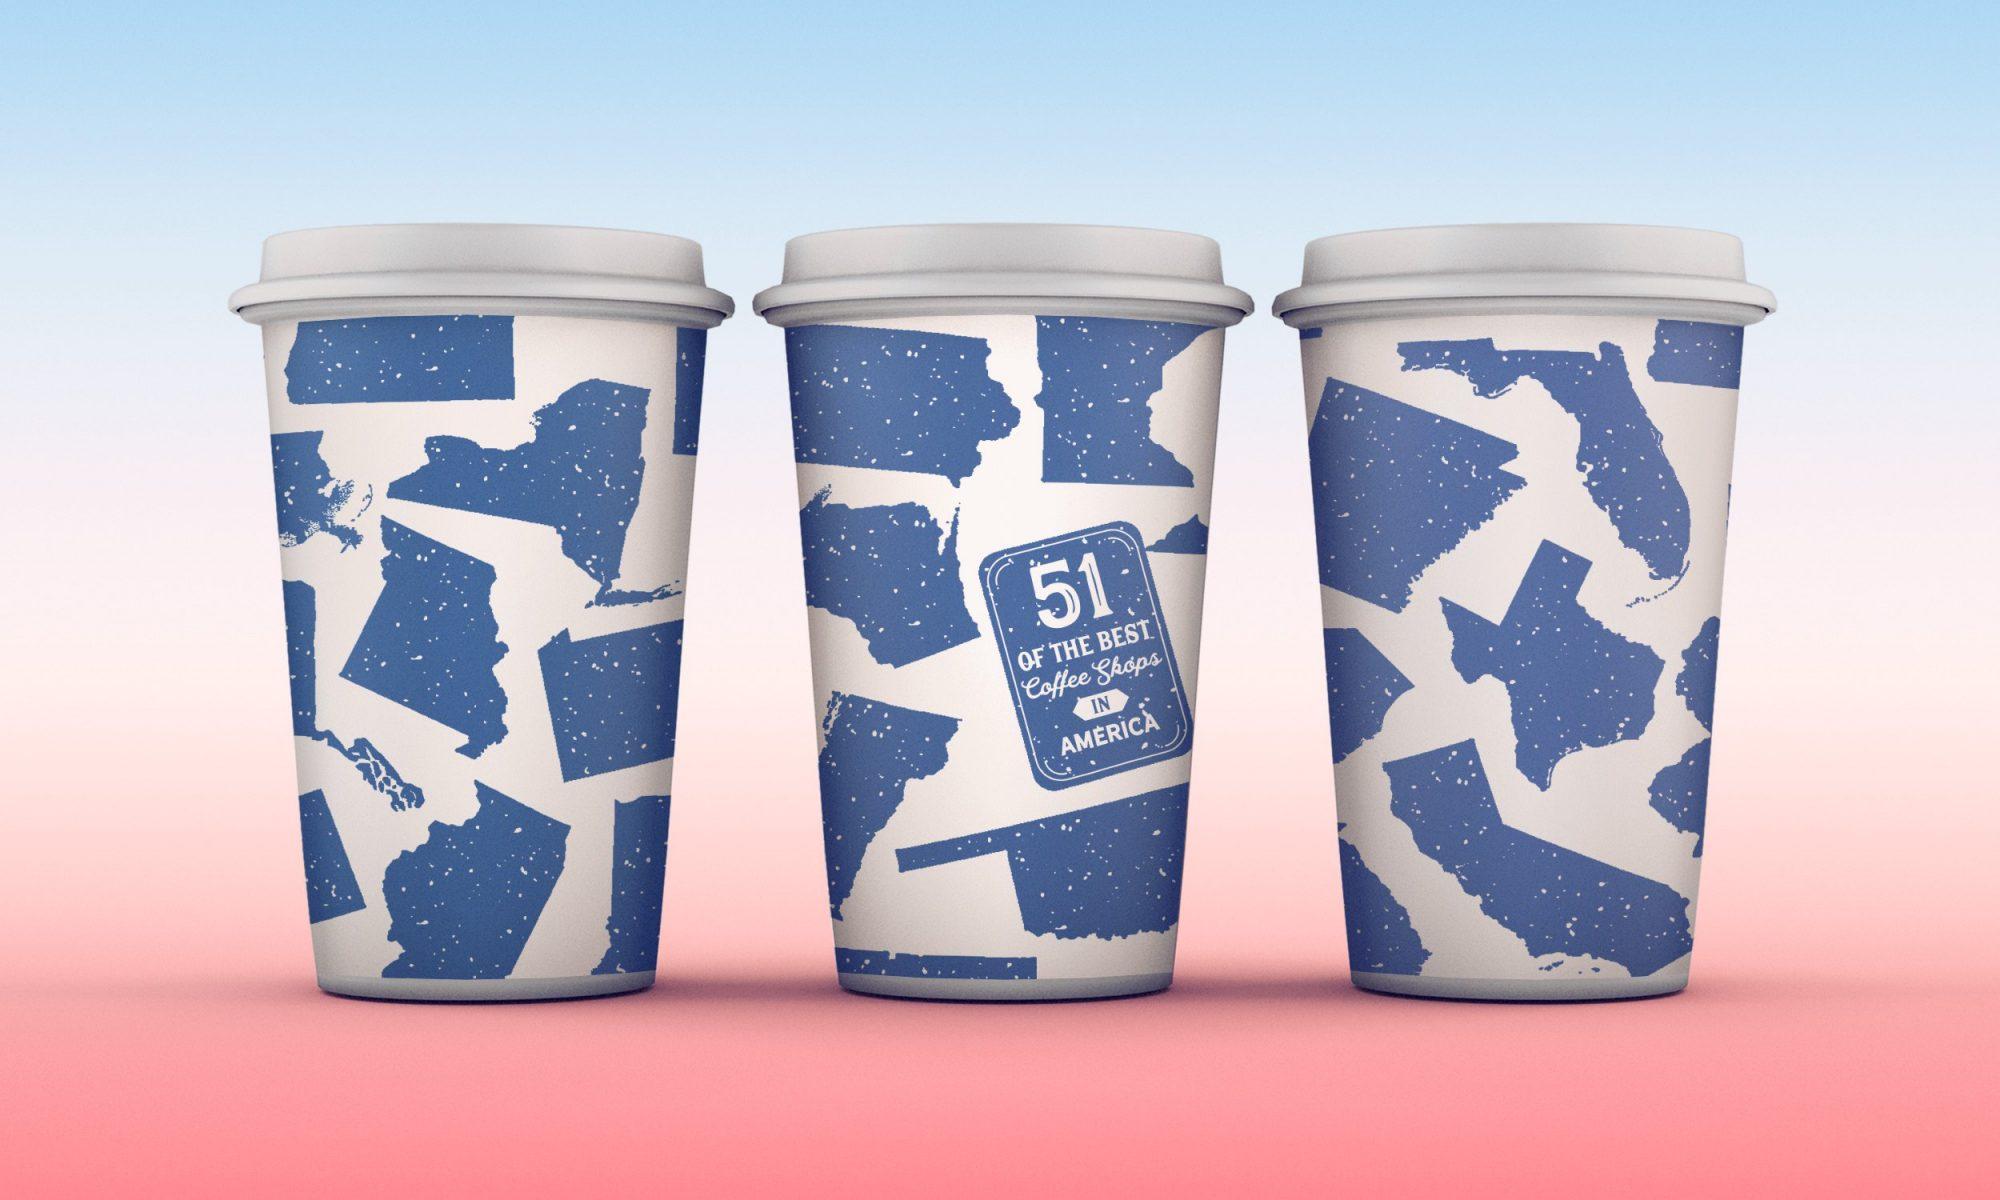 EC: 51 of the Best Coffee Shops in America